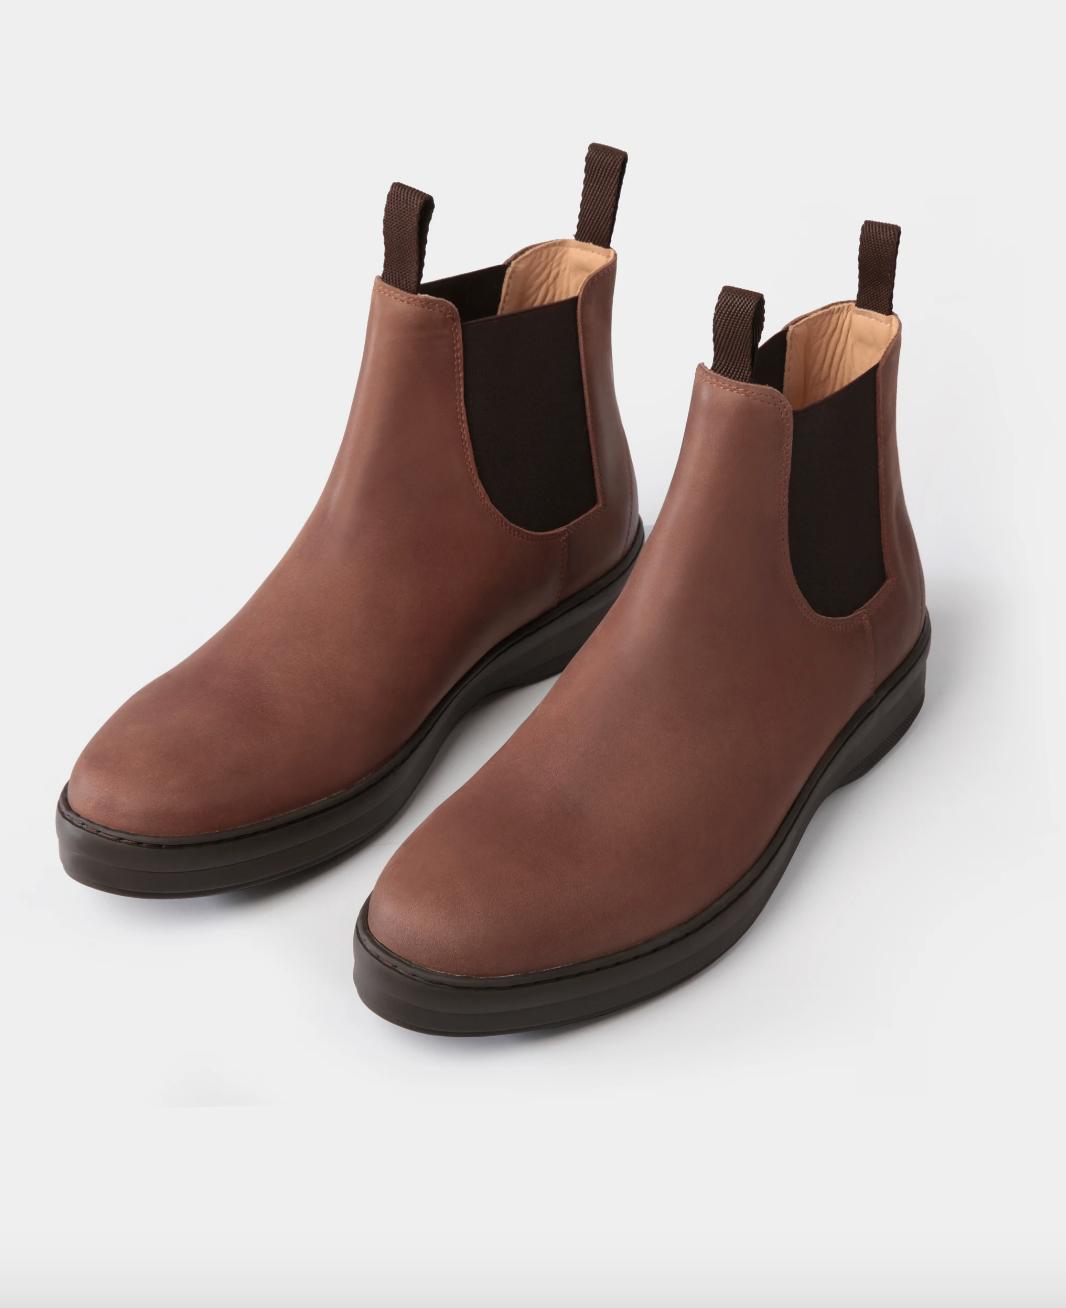 Jack Erwin vs Meermin Shoes Review 1